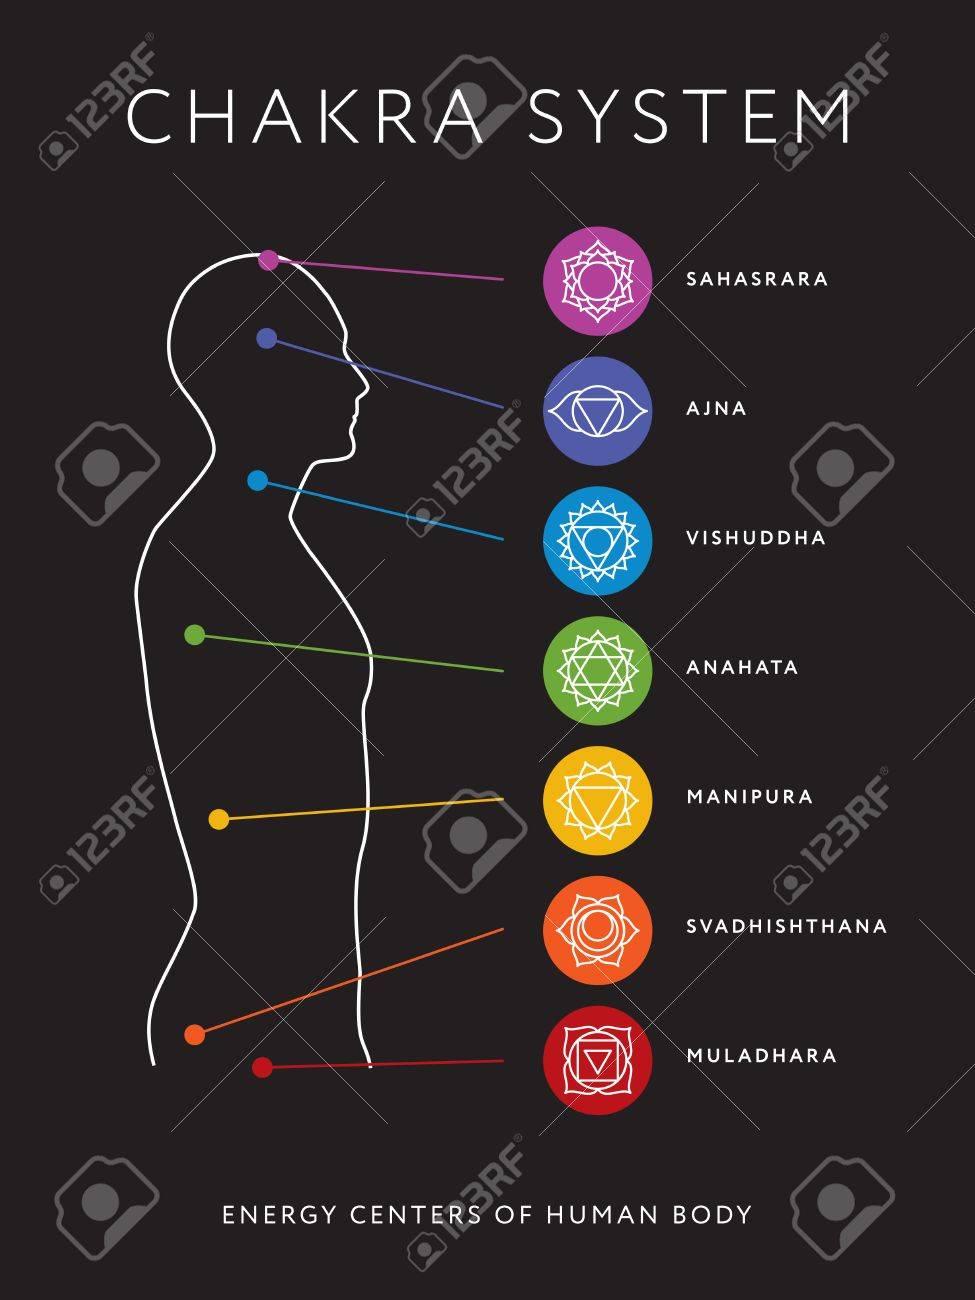 medium resolution of chakra system of human body chart seven chakra symbols location information of each chakra